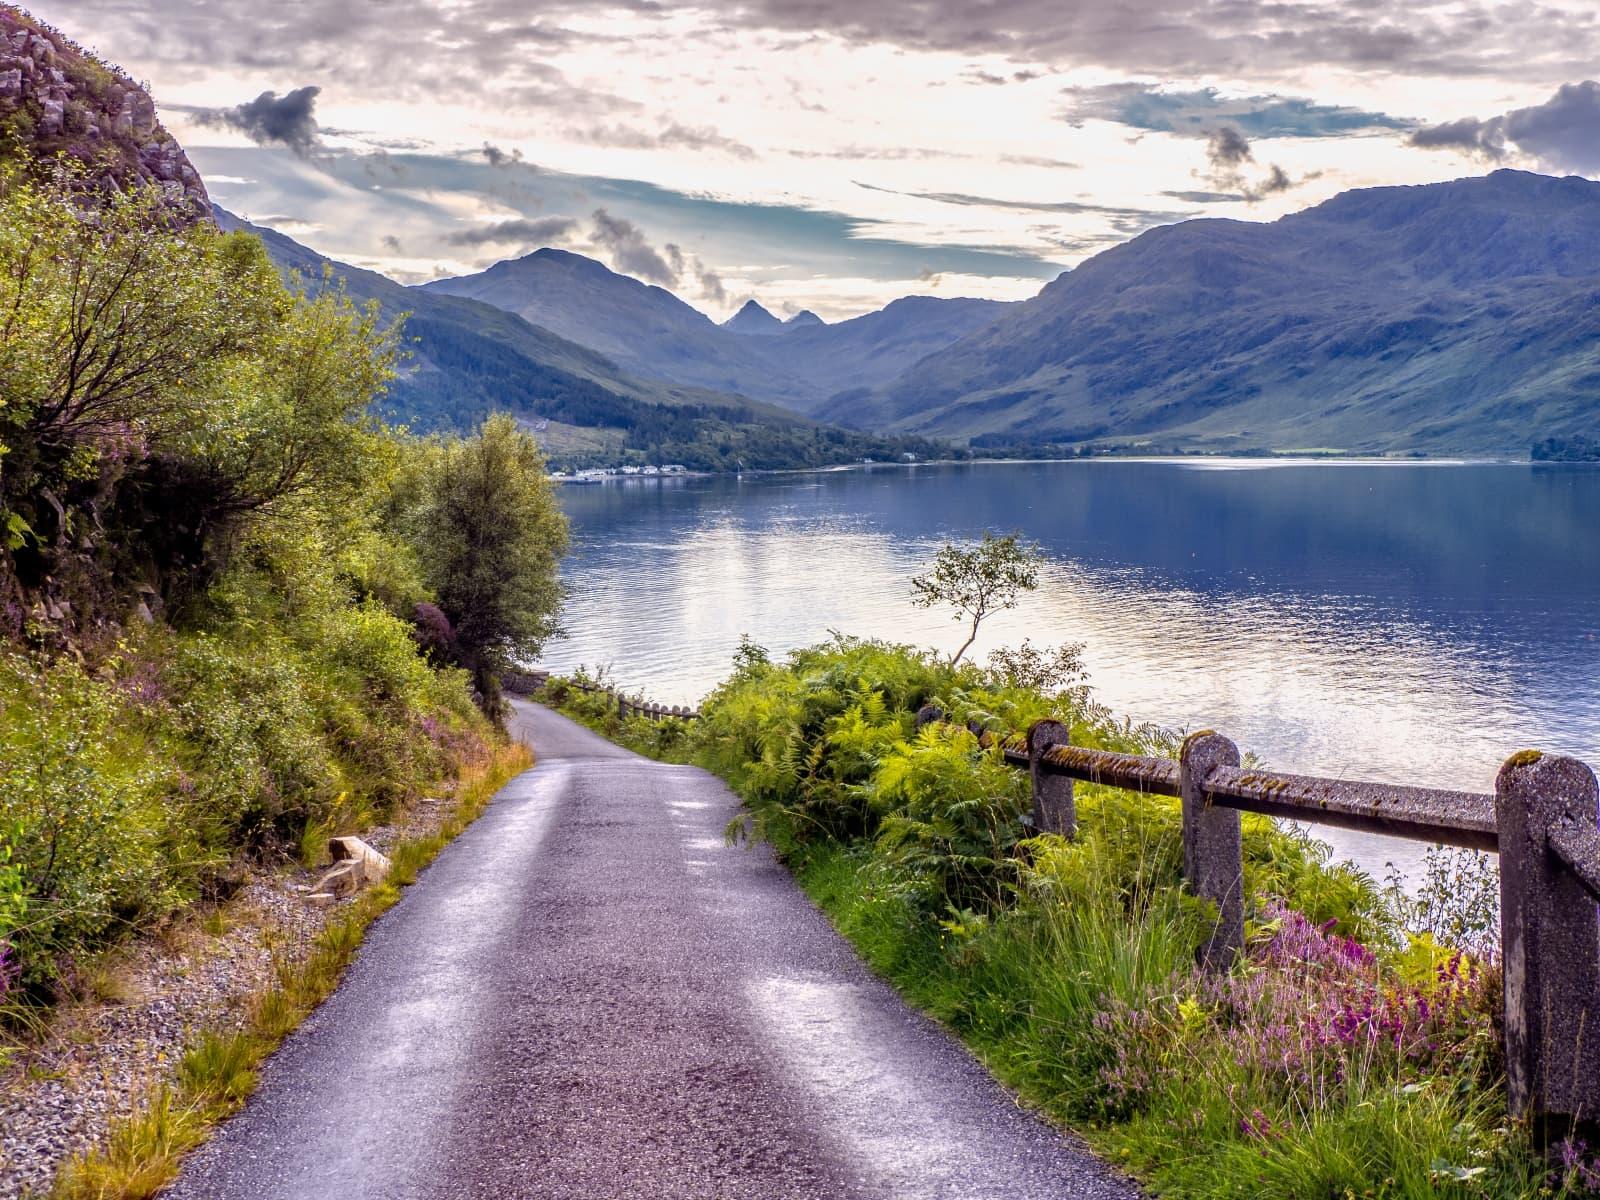 Schottland-8246124-Bearbeitet